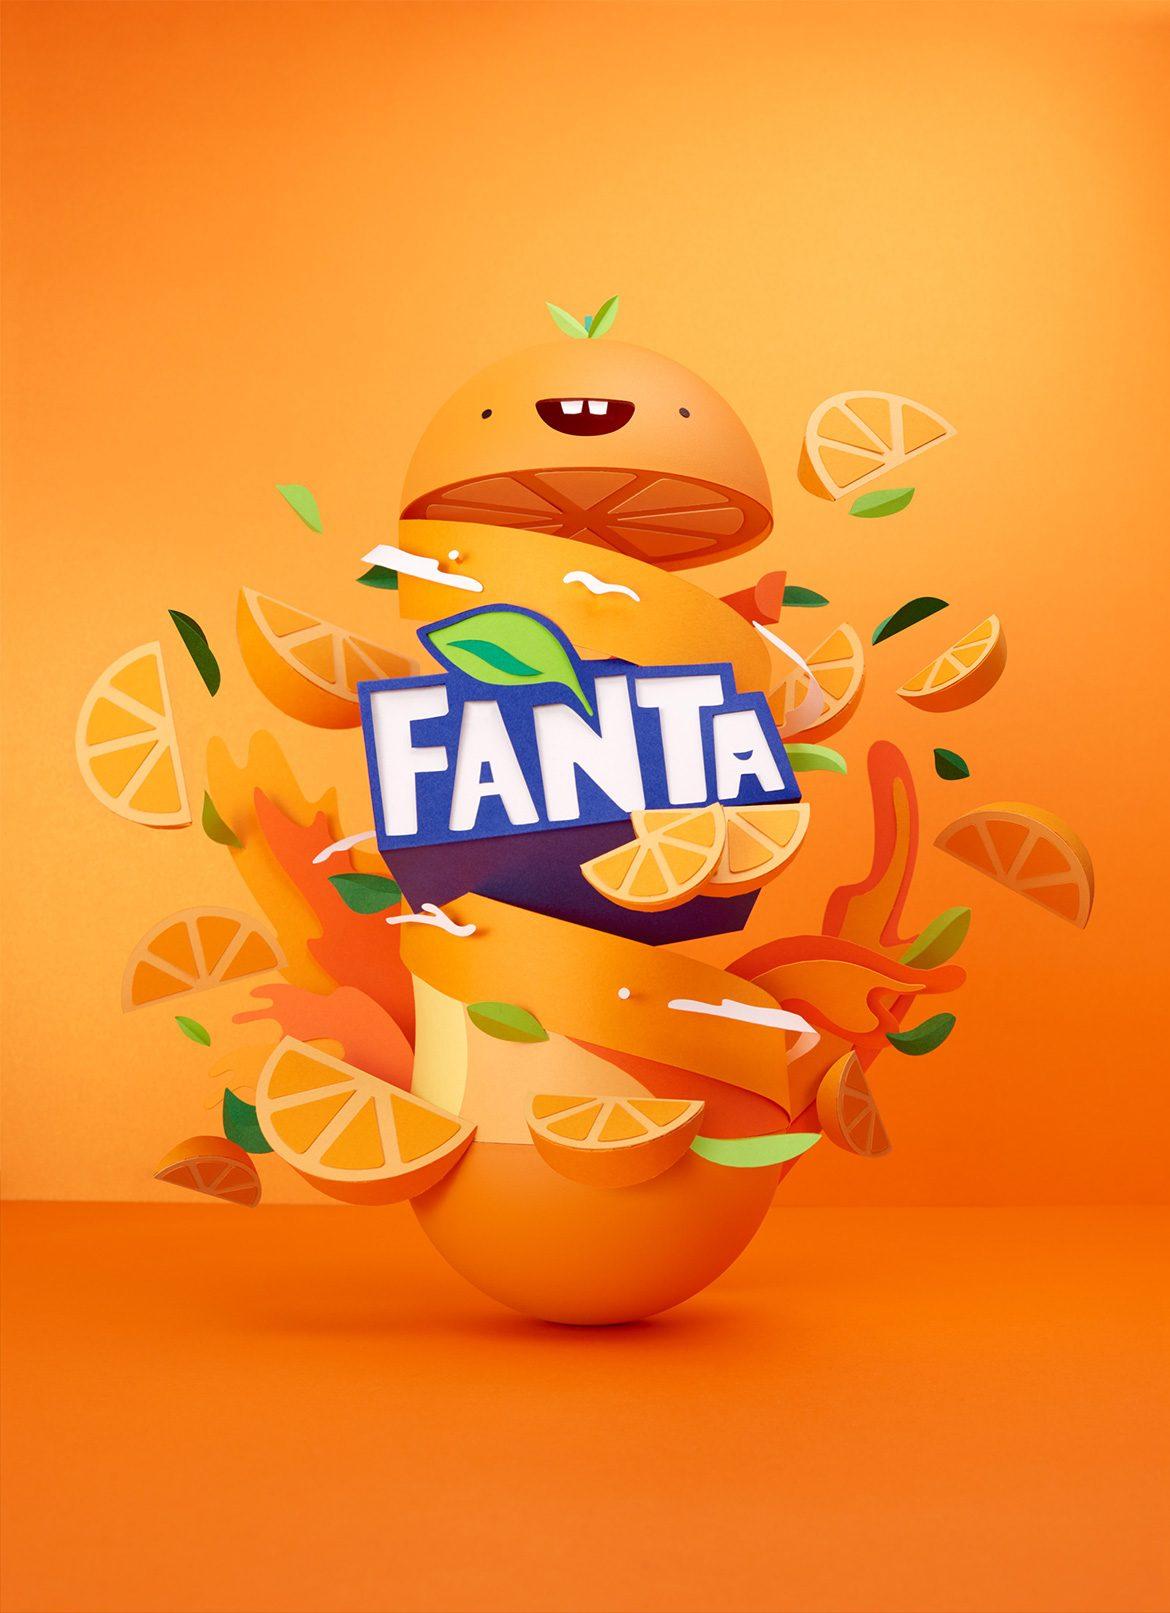 fatna_1600-1170x1613.jpg